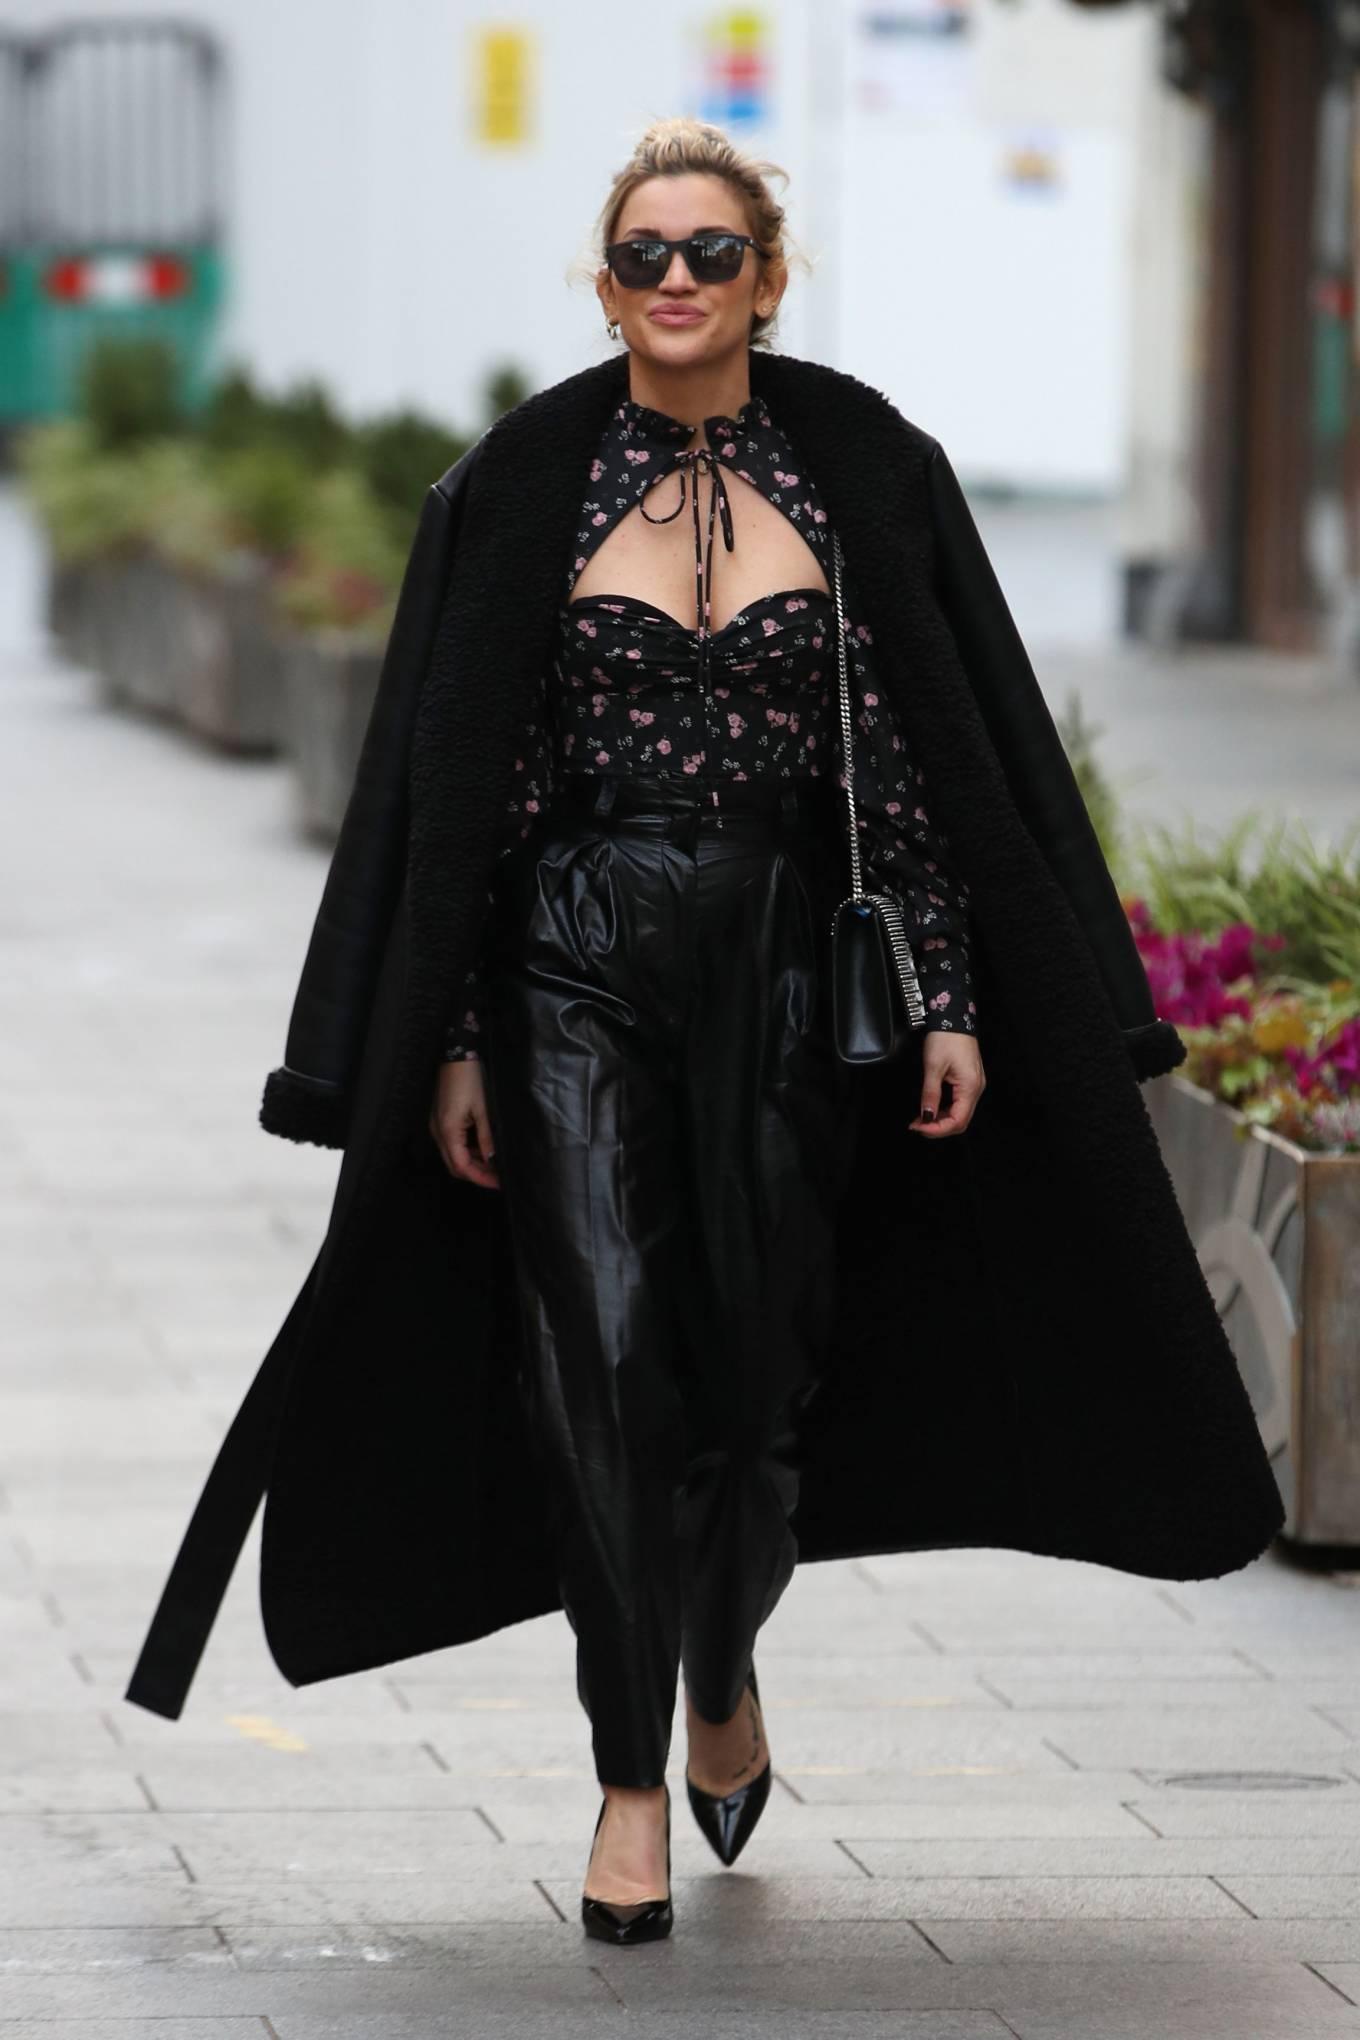 Ashley Roberts 2020 : Ashley Roberts – Looks chic leaving the Global Radio Studios in London-28